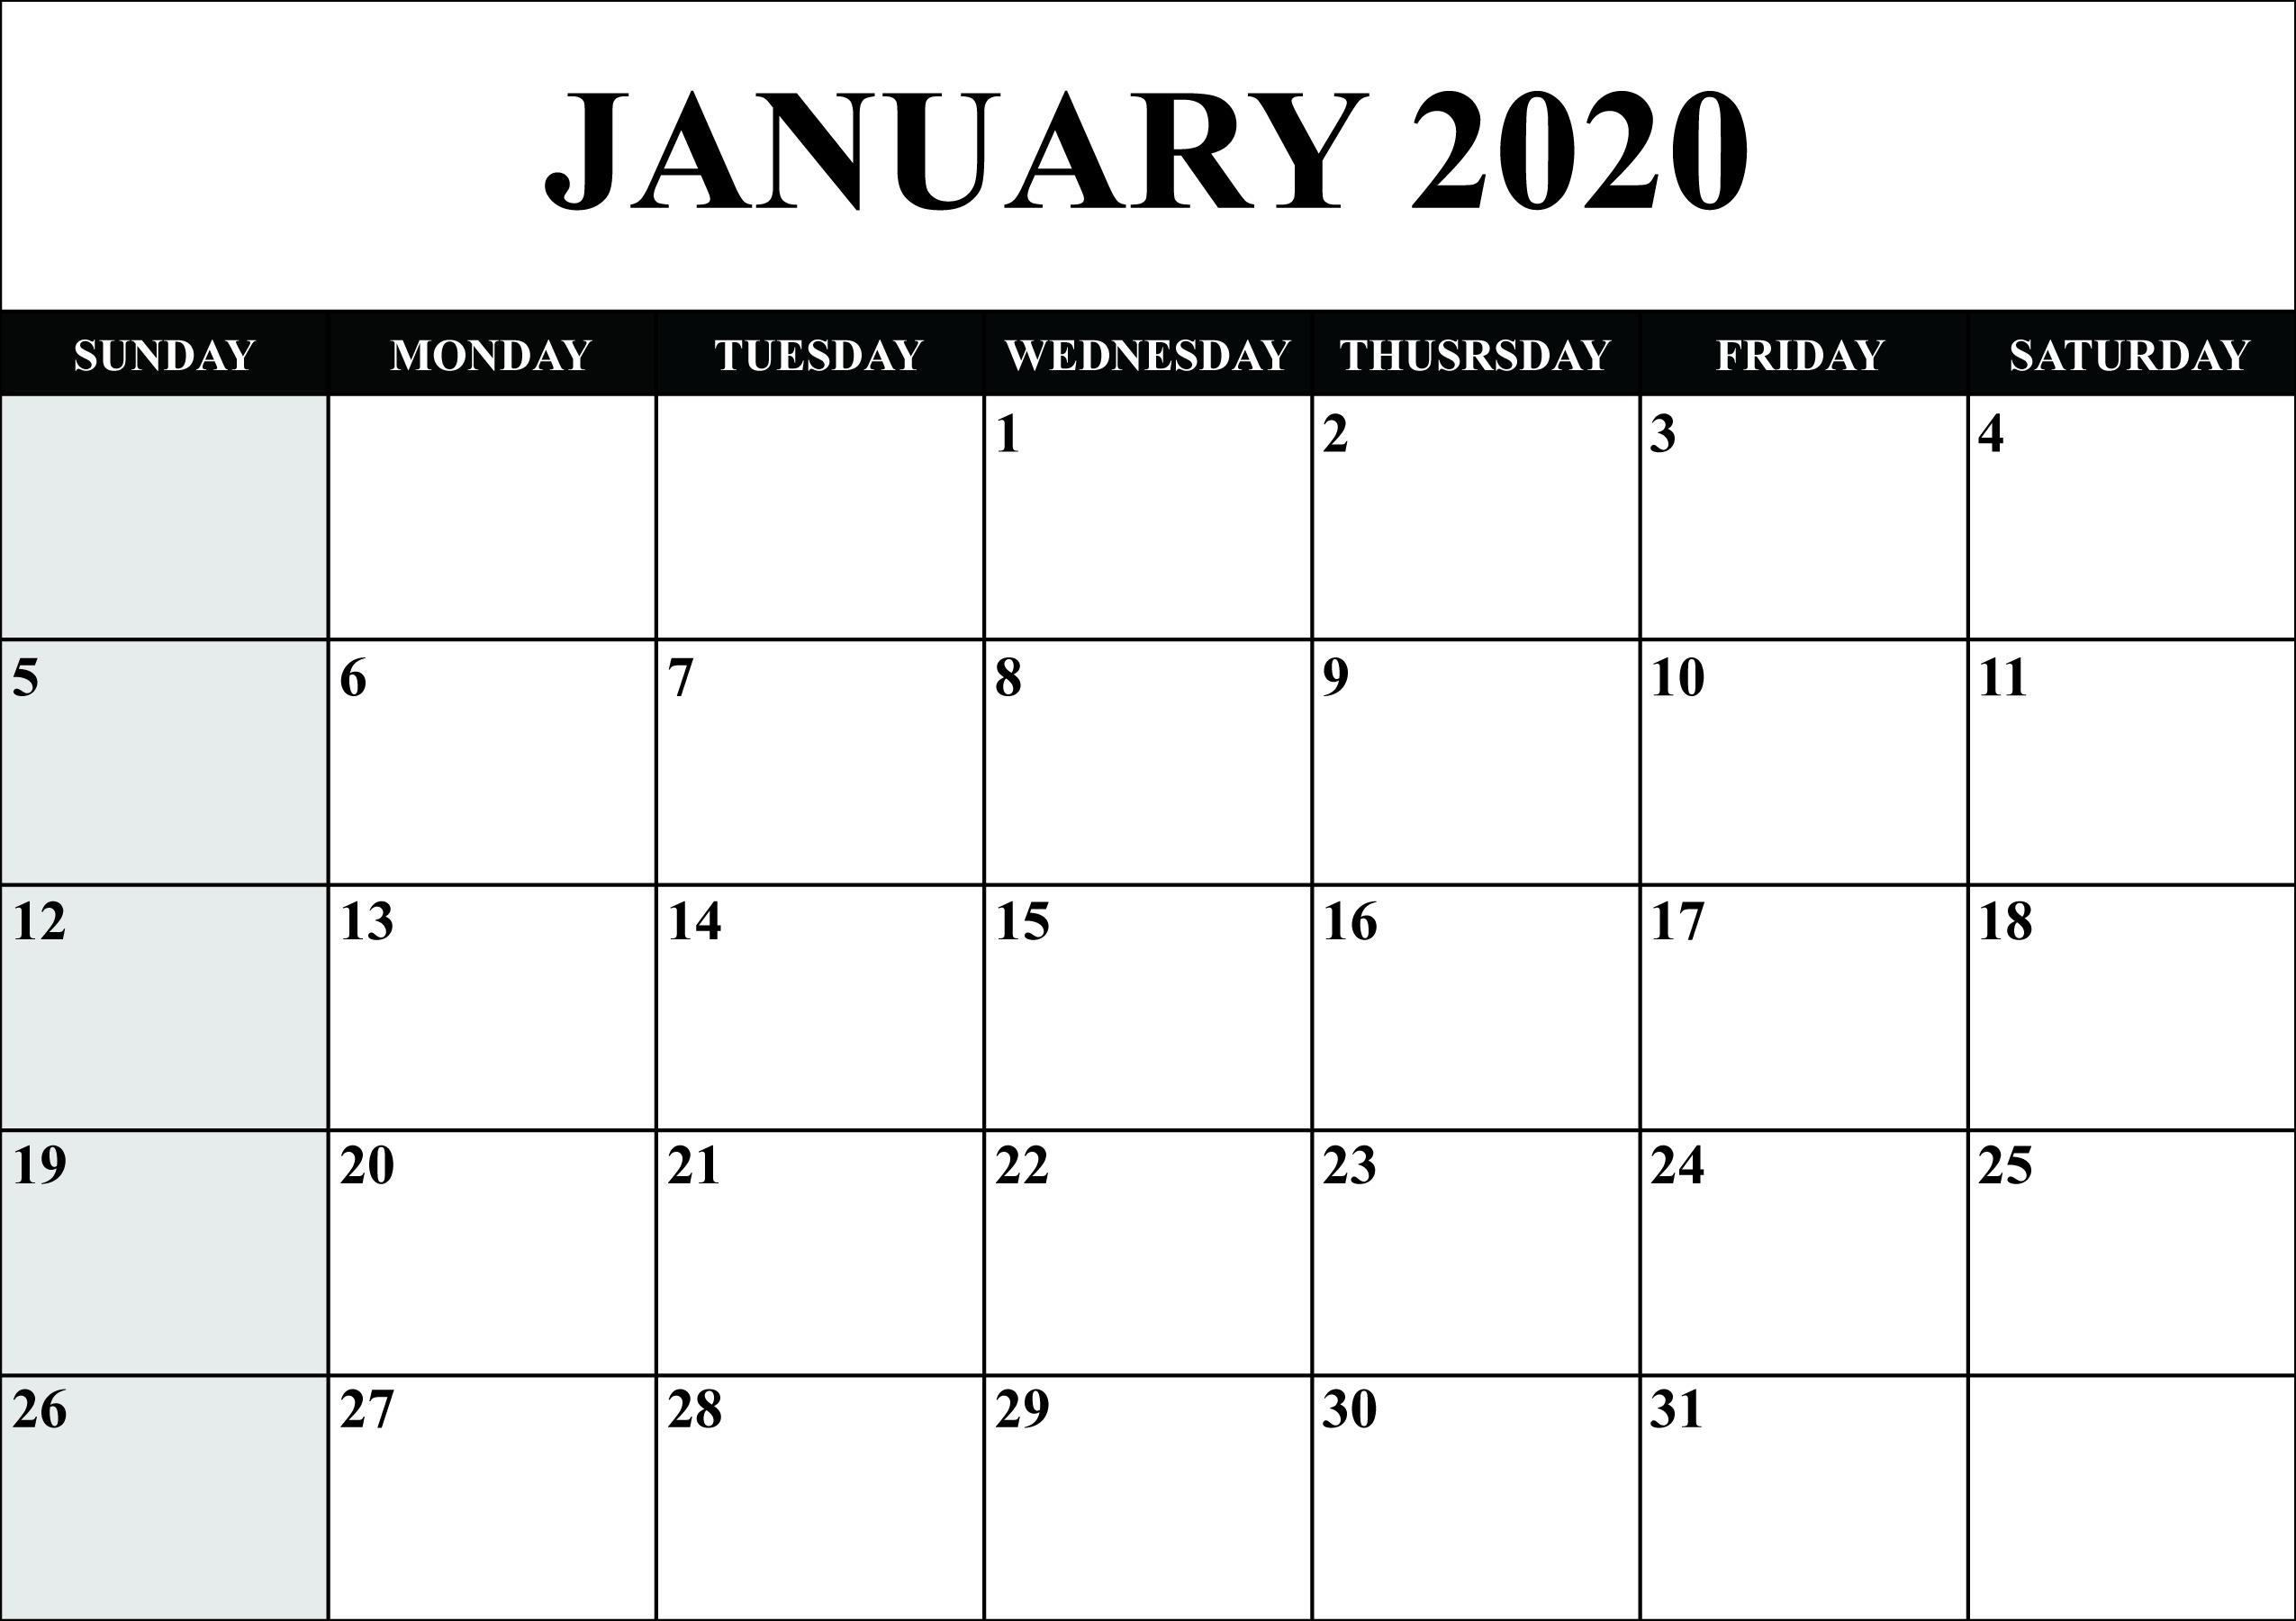 Free January 2020 Calendar Printable - Blank Templates